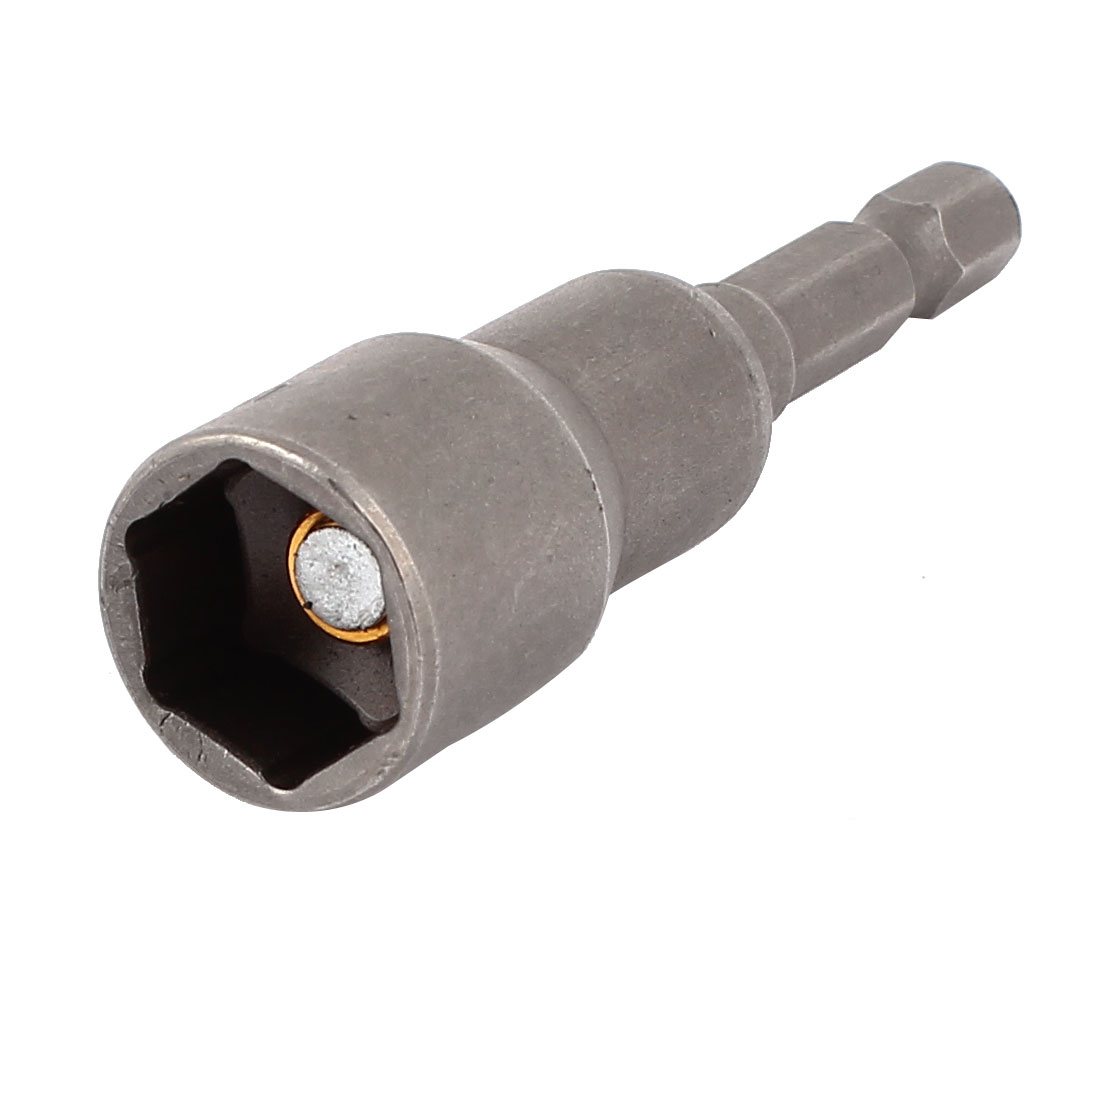 "1/4"" Hexagon Shank 13mm Hex Magnetic Nut Socket Driver Bit Adapter 65mm Long"